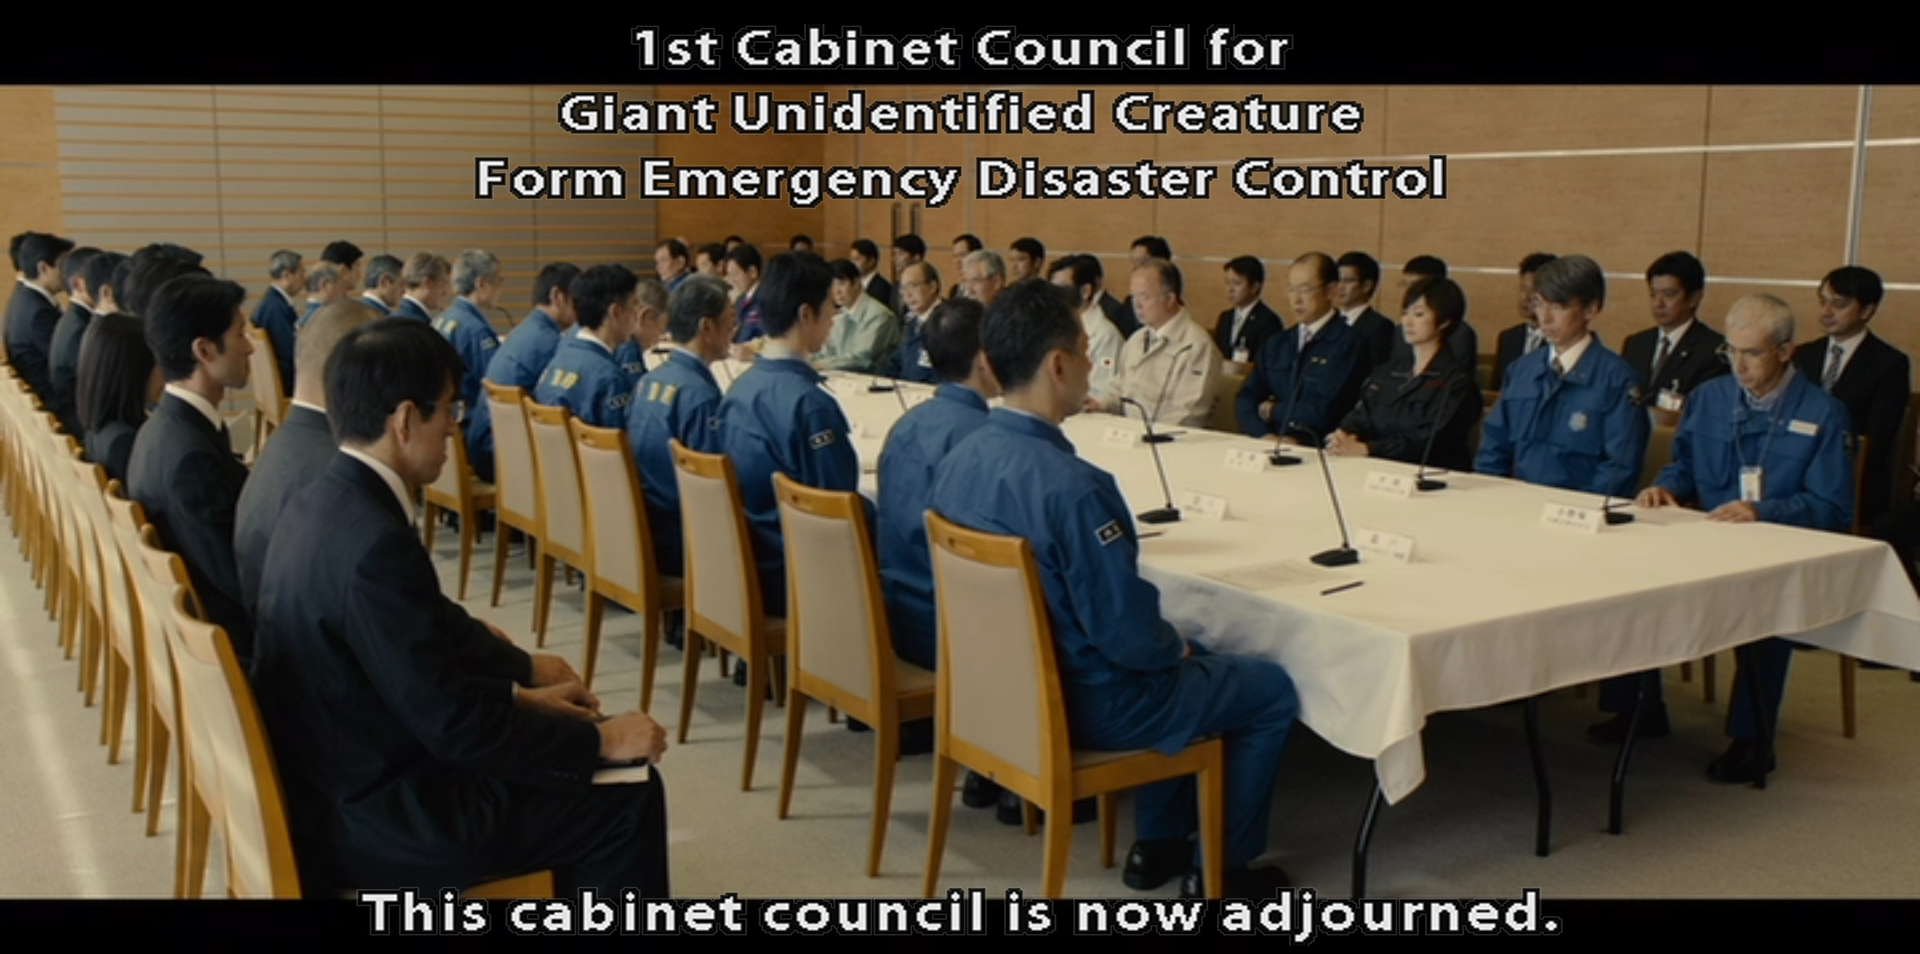 Shin Godzilla's primary opponent: bureaucracy